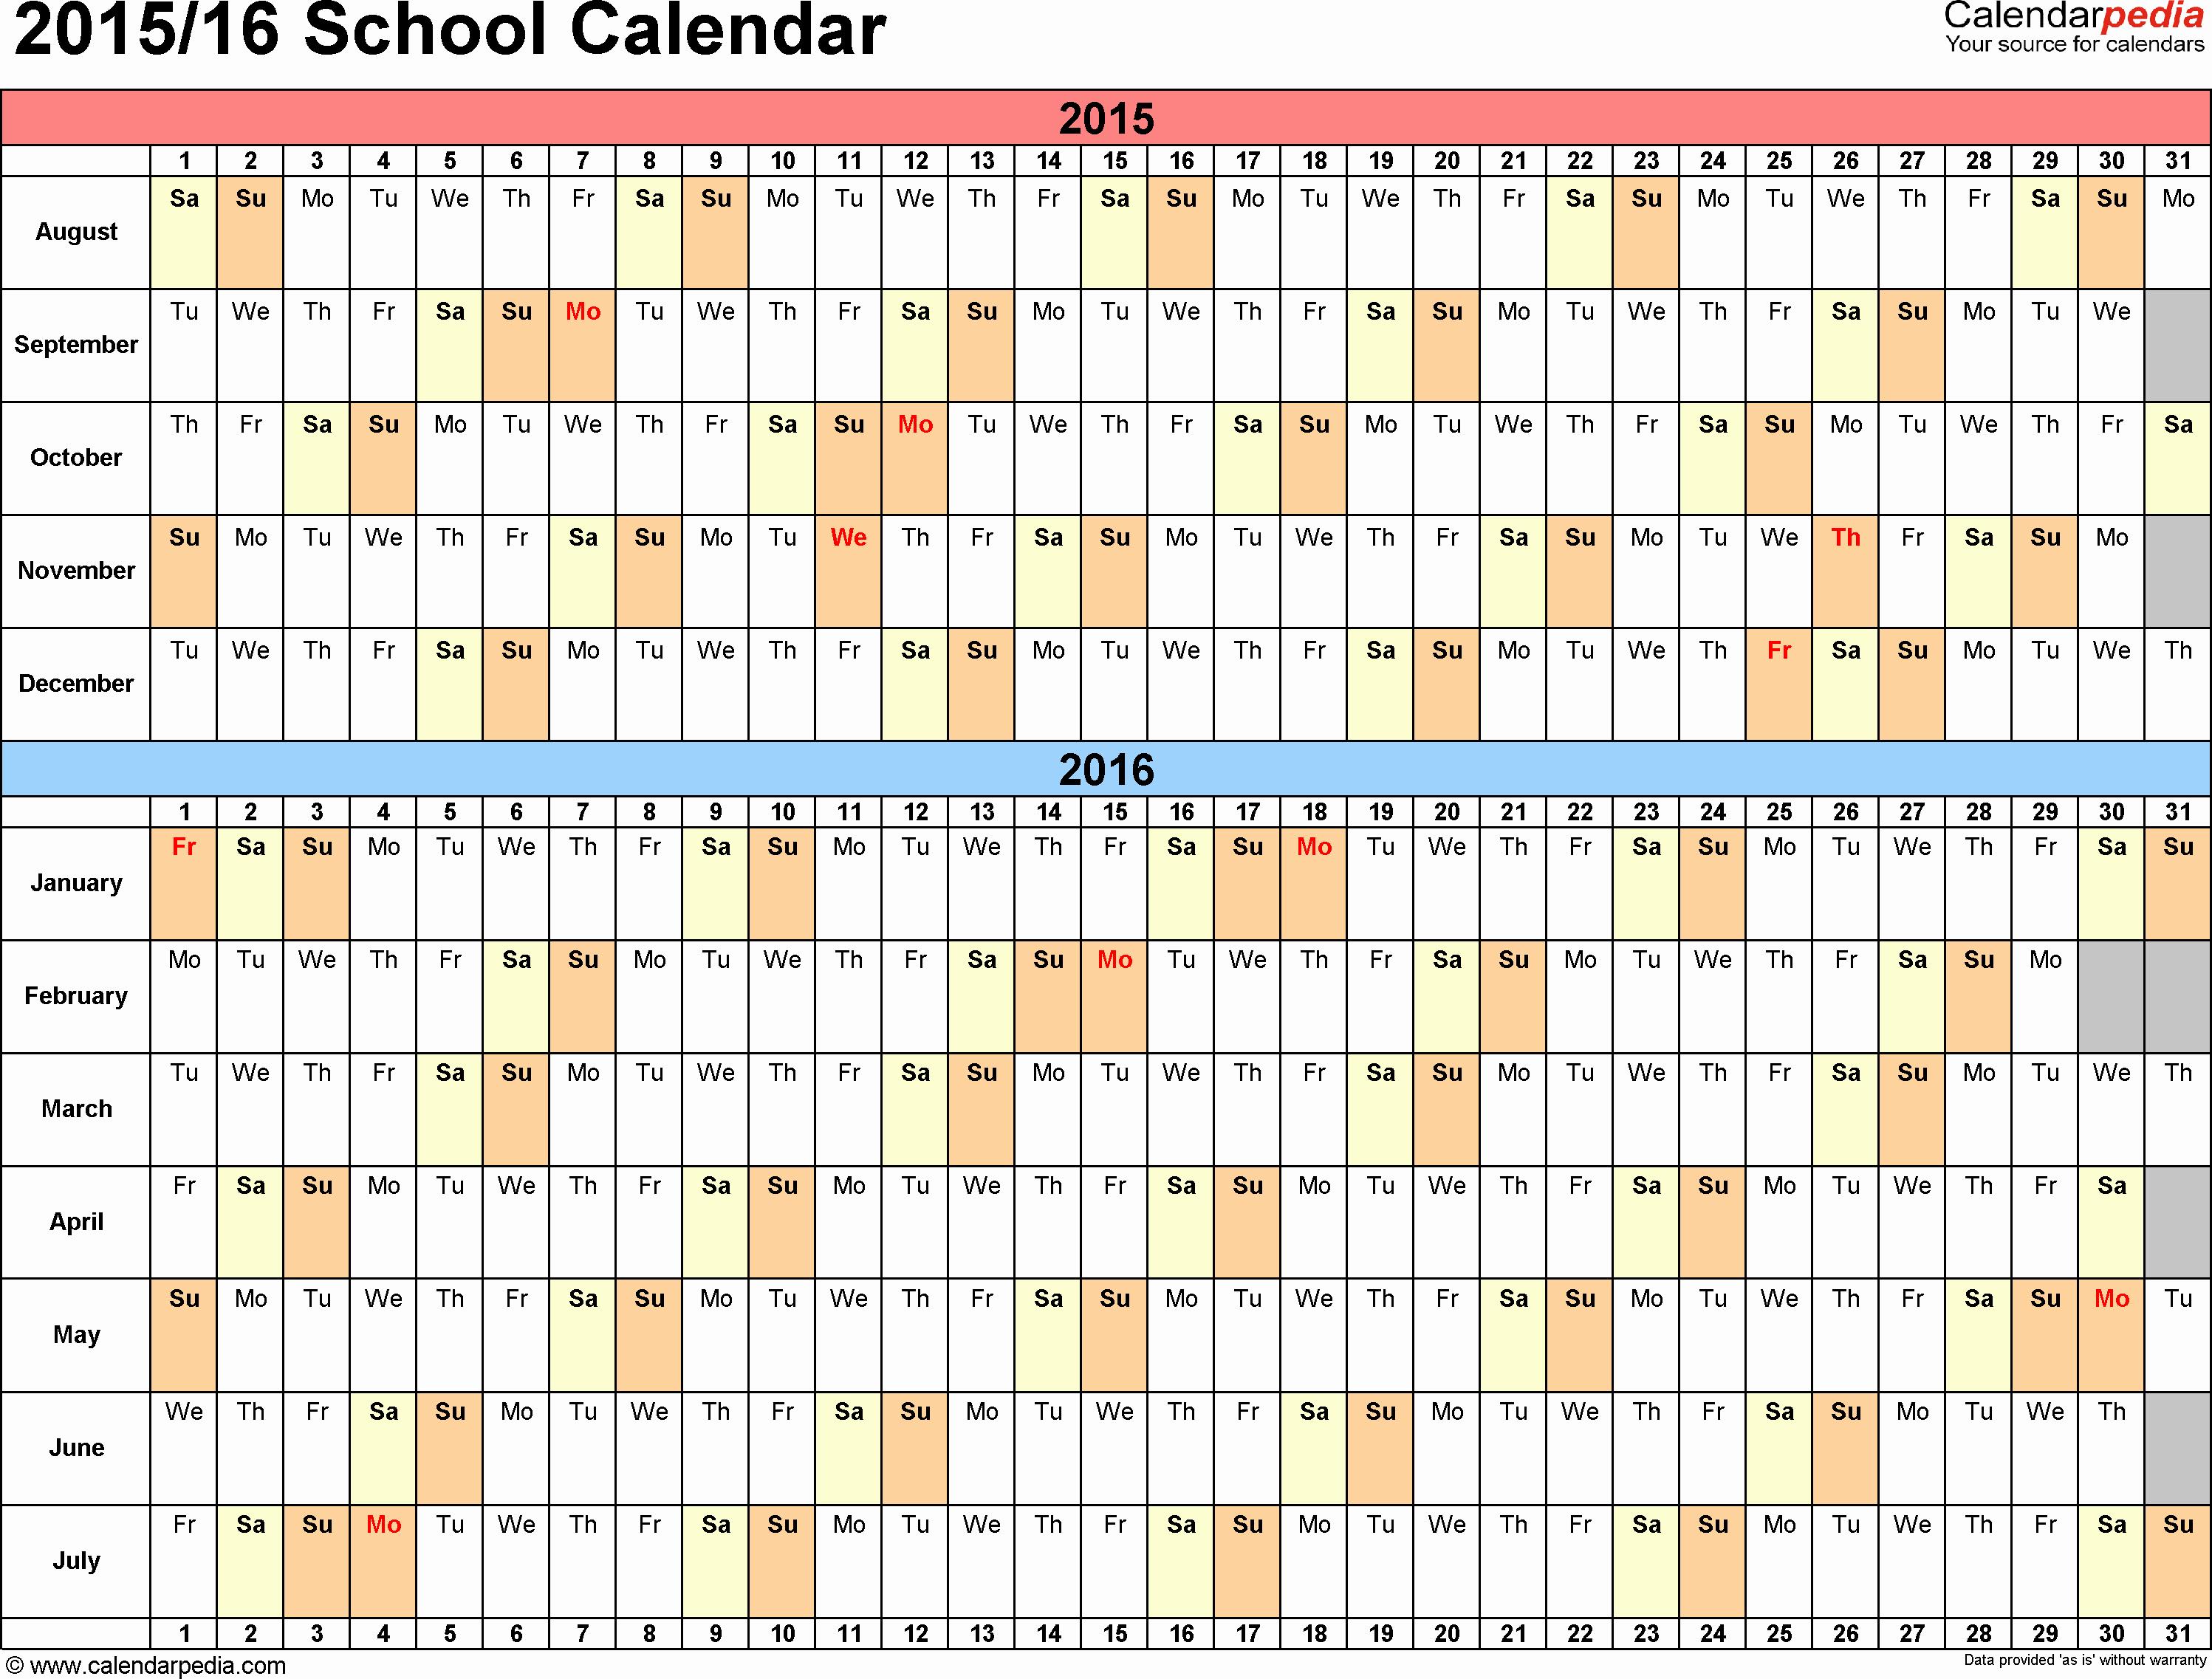 2016 2017 School Calendar Template Elegant School Calendars 2015 2016 as Free Printable Word Templates